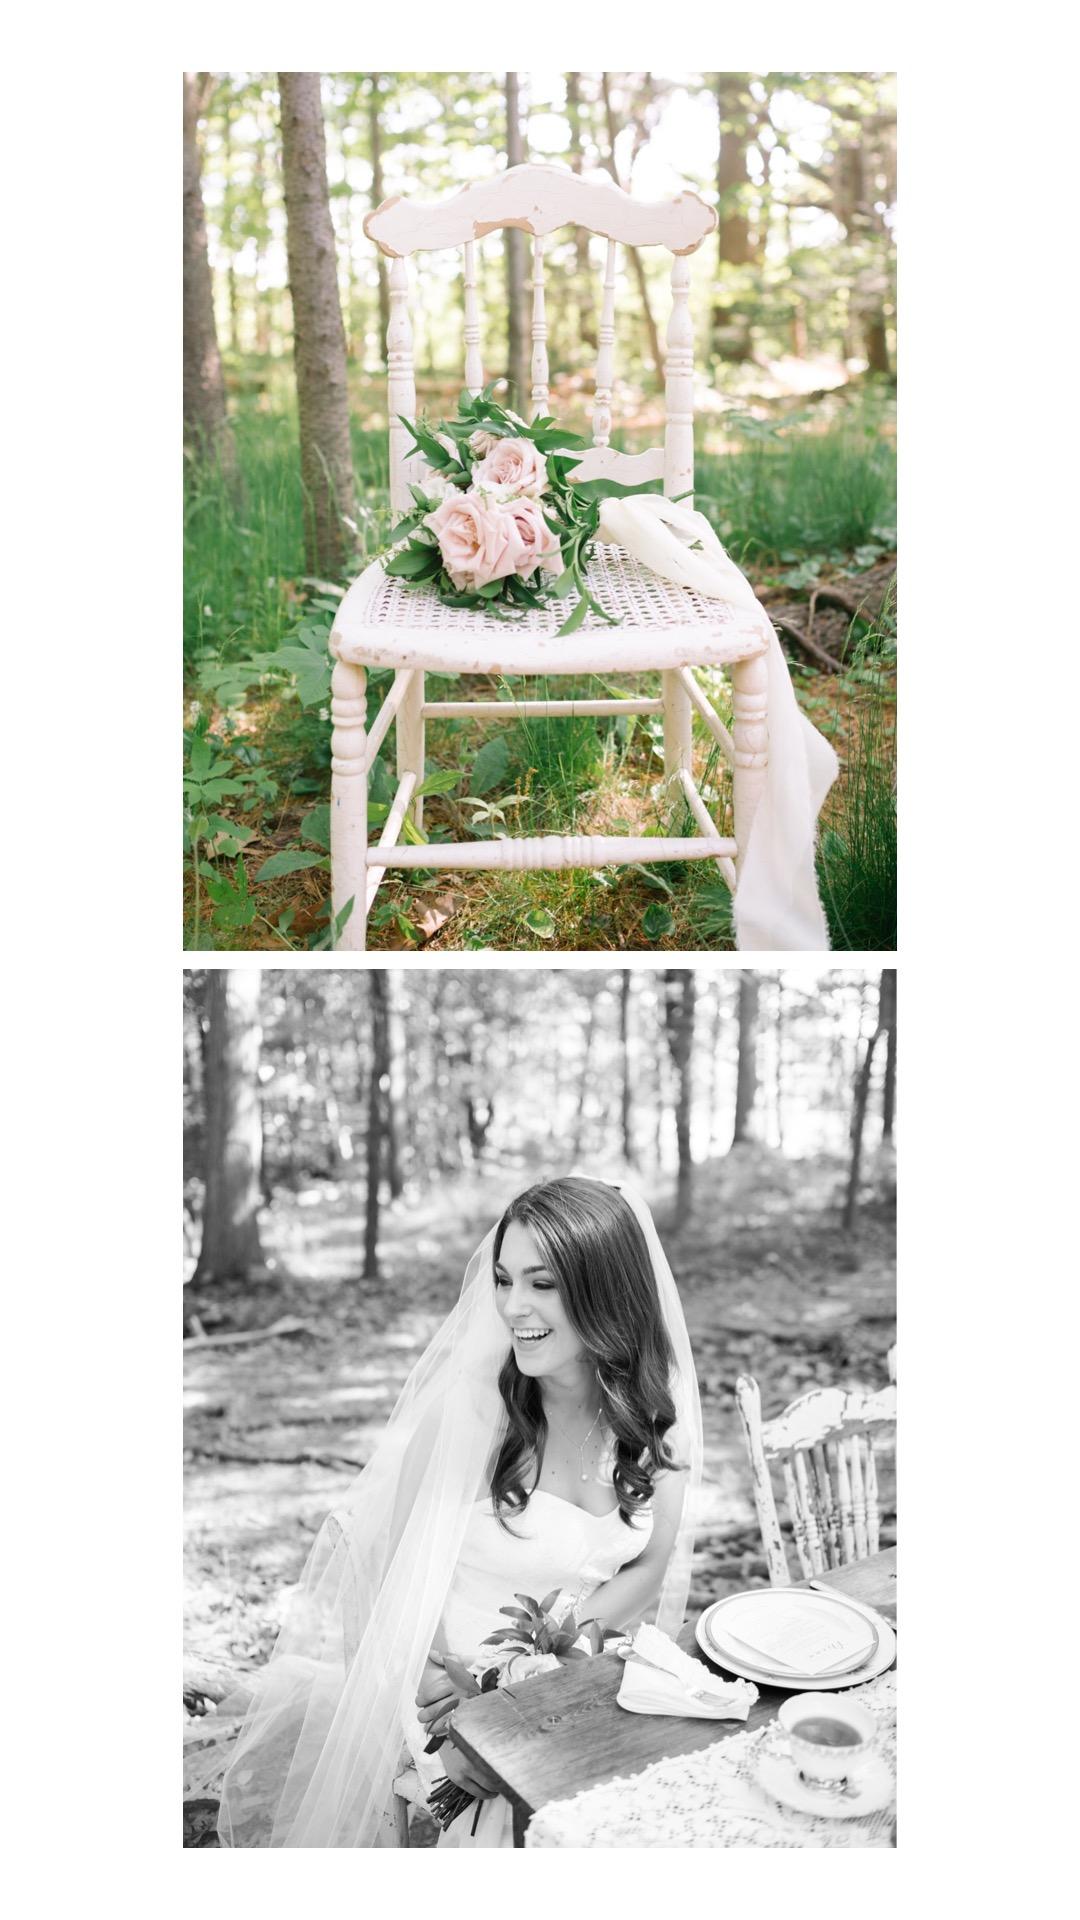 Halifax Wedding Photographer Styled Shoot - Gray Weddings & Events - Sinead Dubeau Photography 02